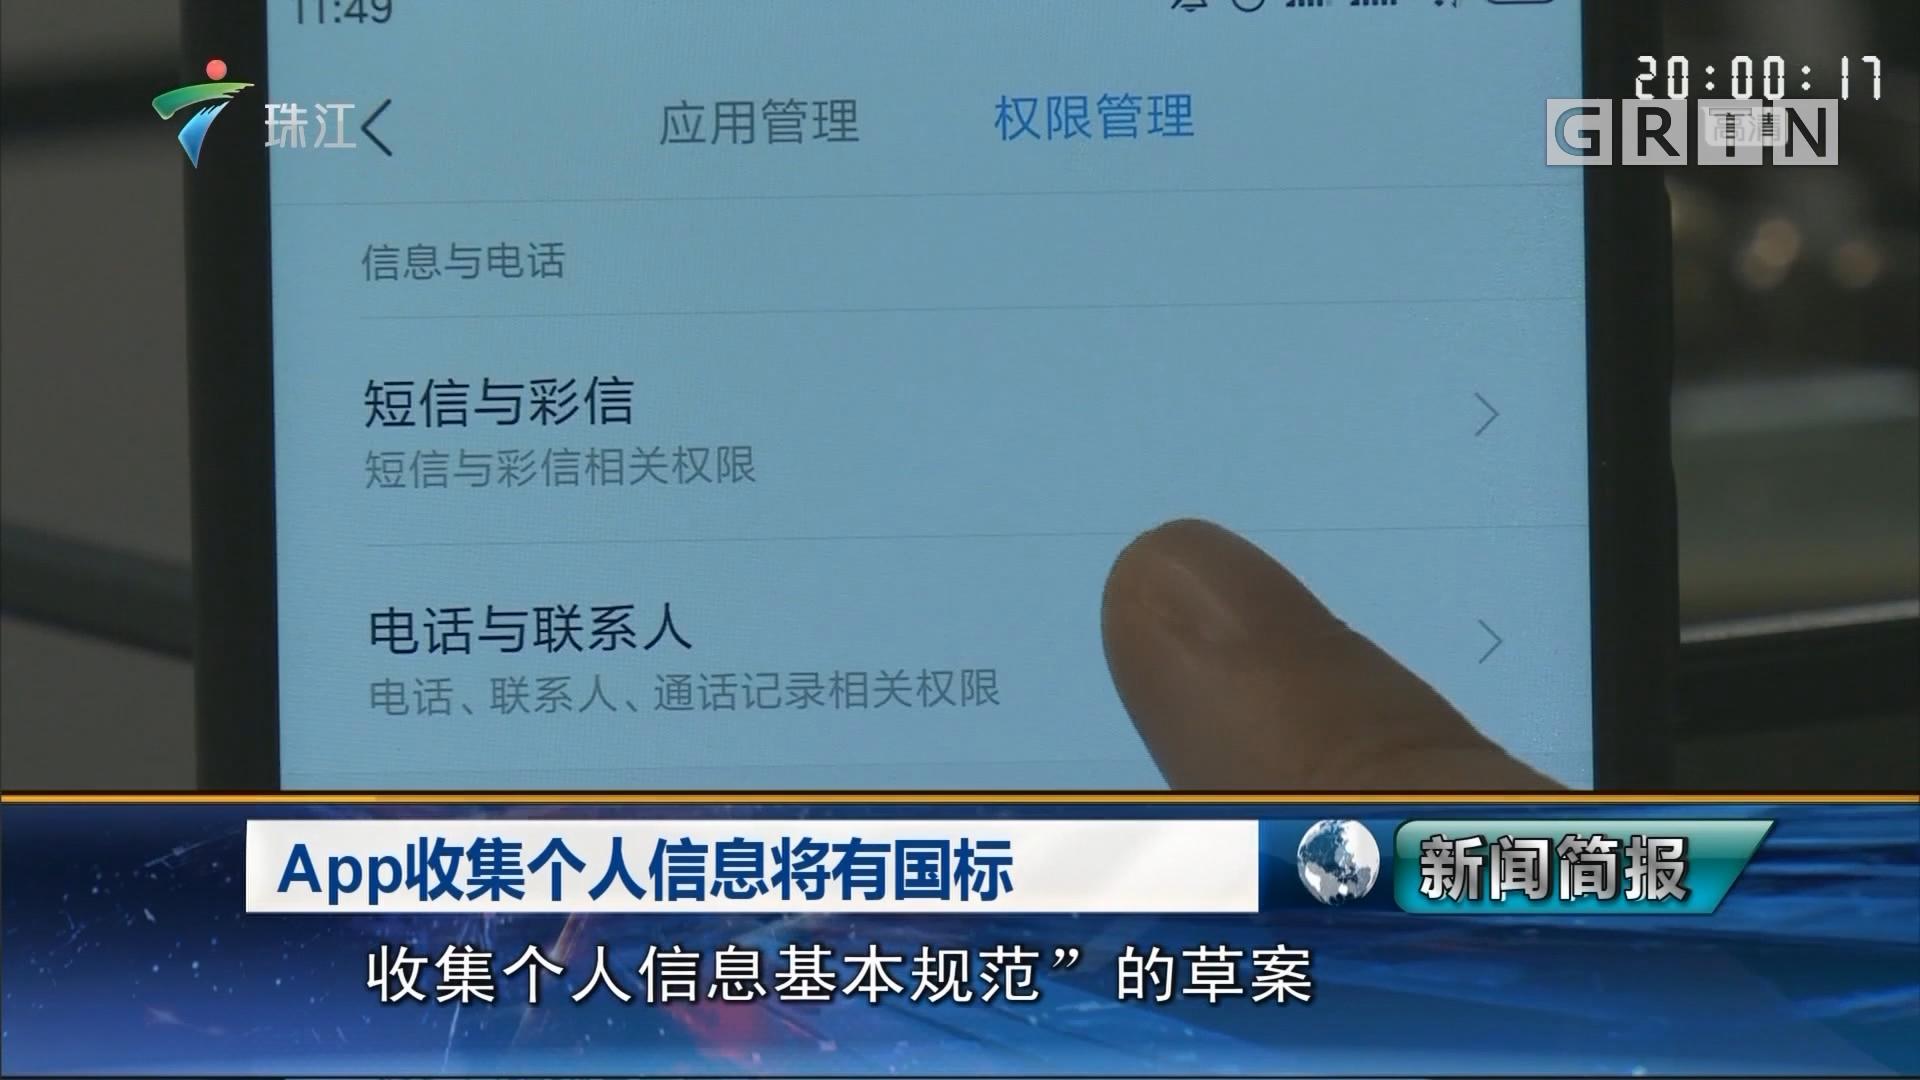 App收集个人信息将有国标